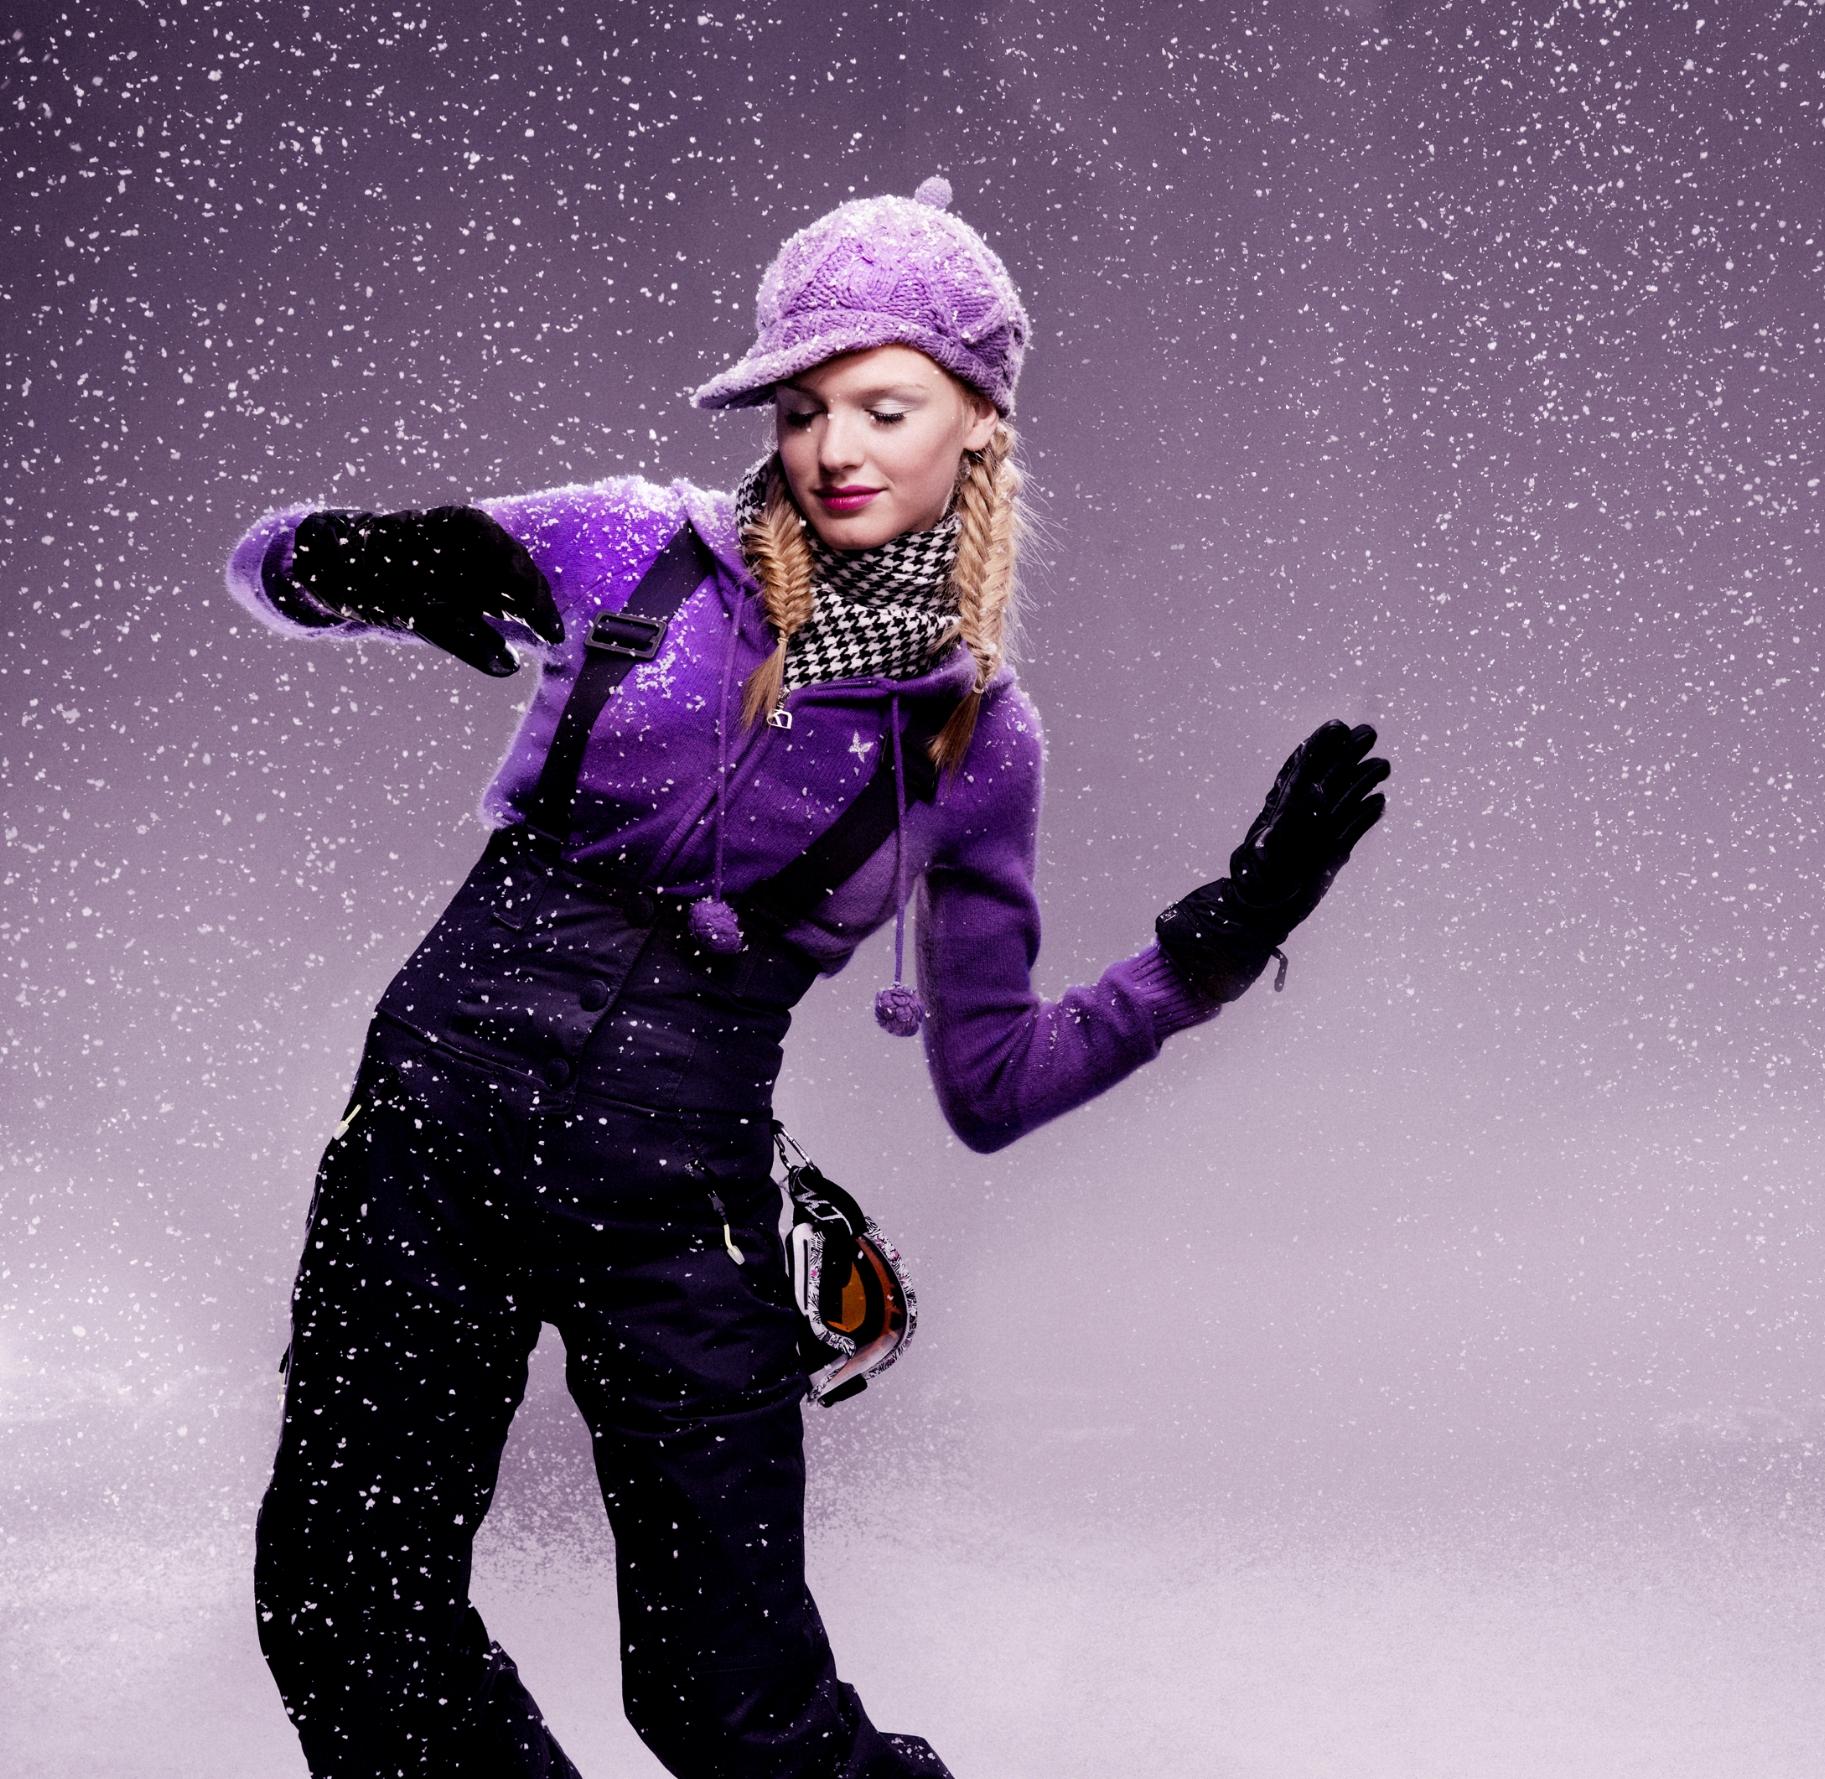 Winter_Wonderland_Krøvel (4).jpg